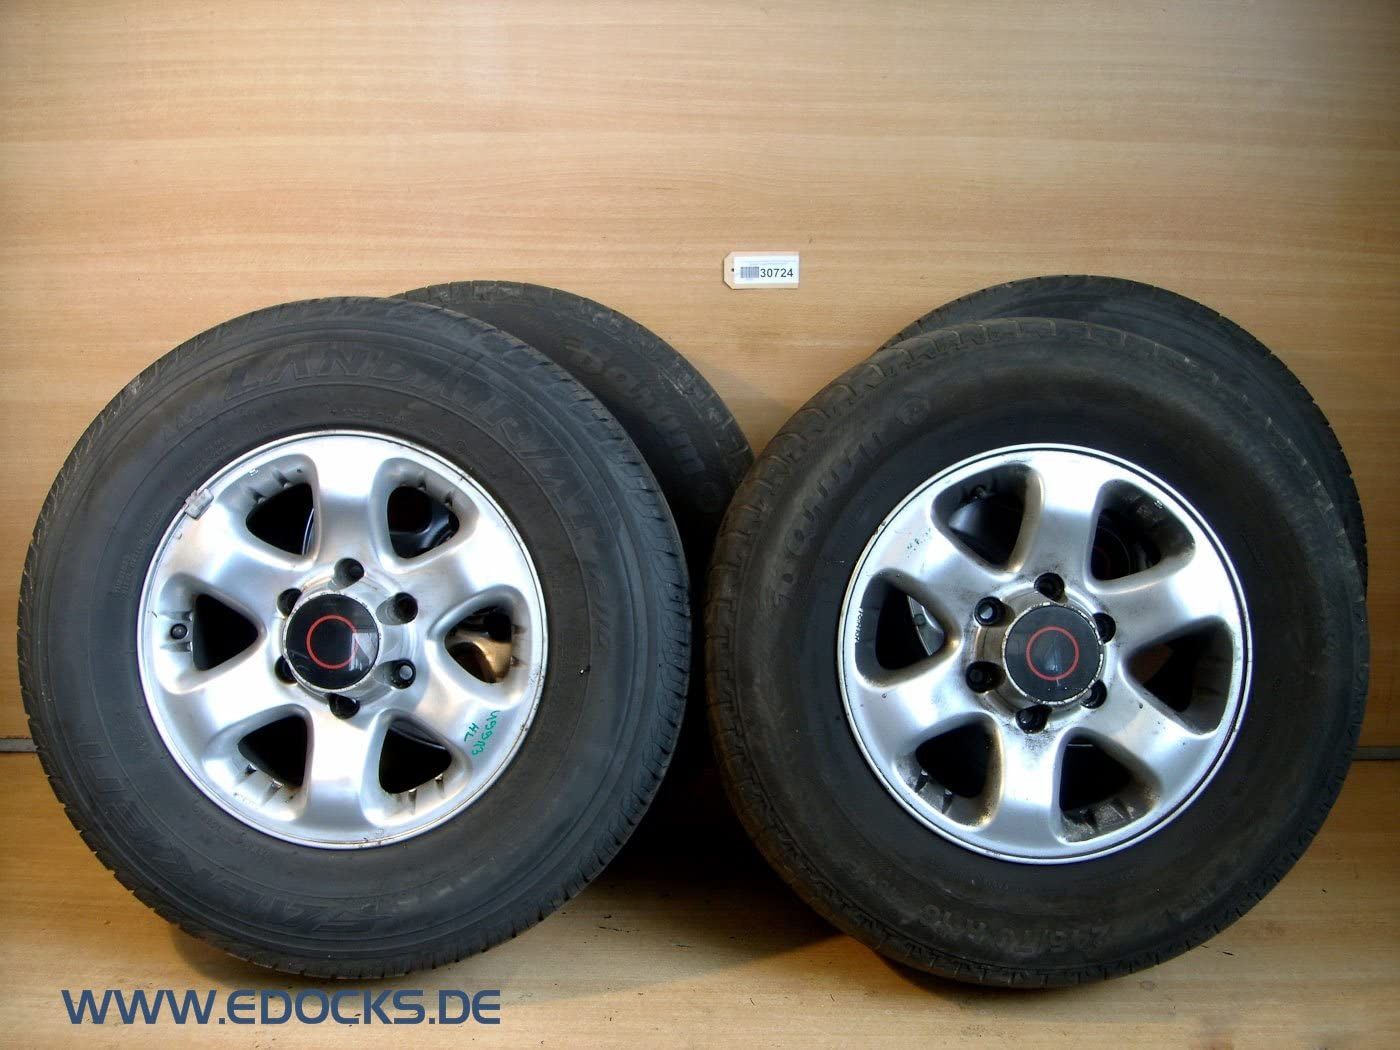 Satz Alufelgen Reifen 245 70 R16 16 Zoll Frontera B Original Opel Auto